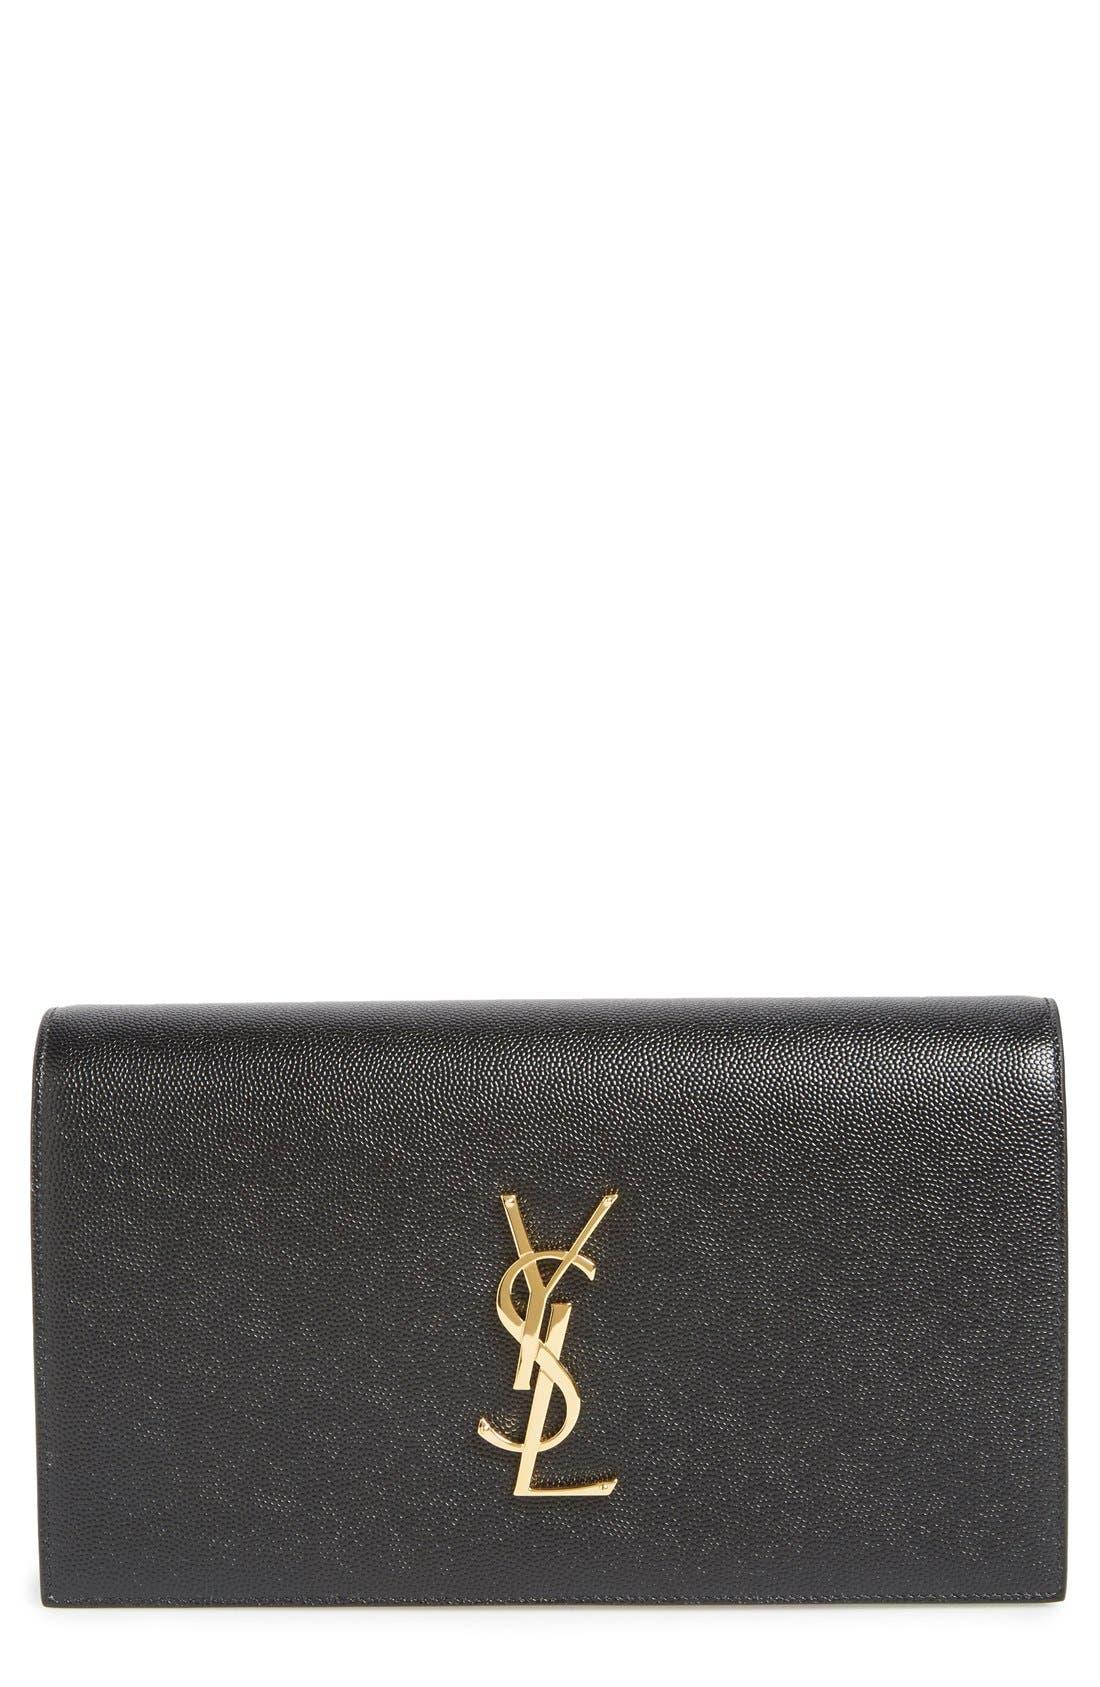 Alternate Image 1 Selected - Saint Laurent 'Monogram' Leather Clutch